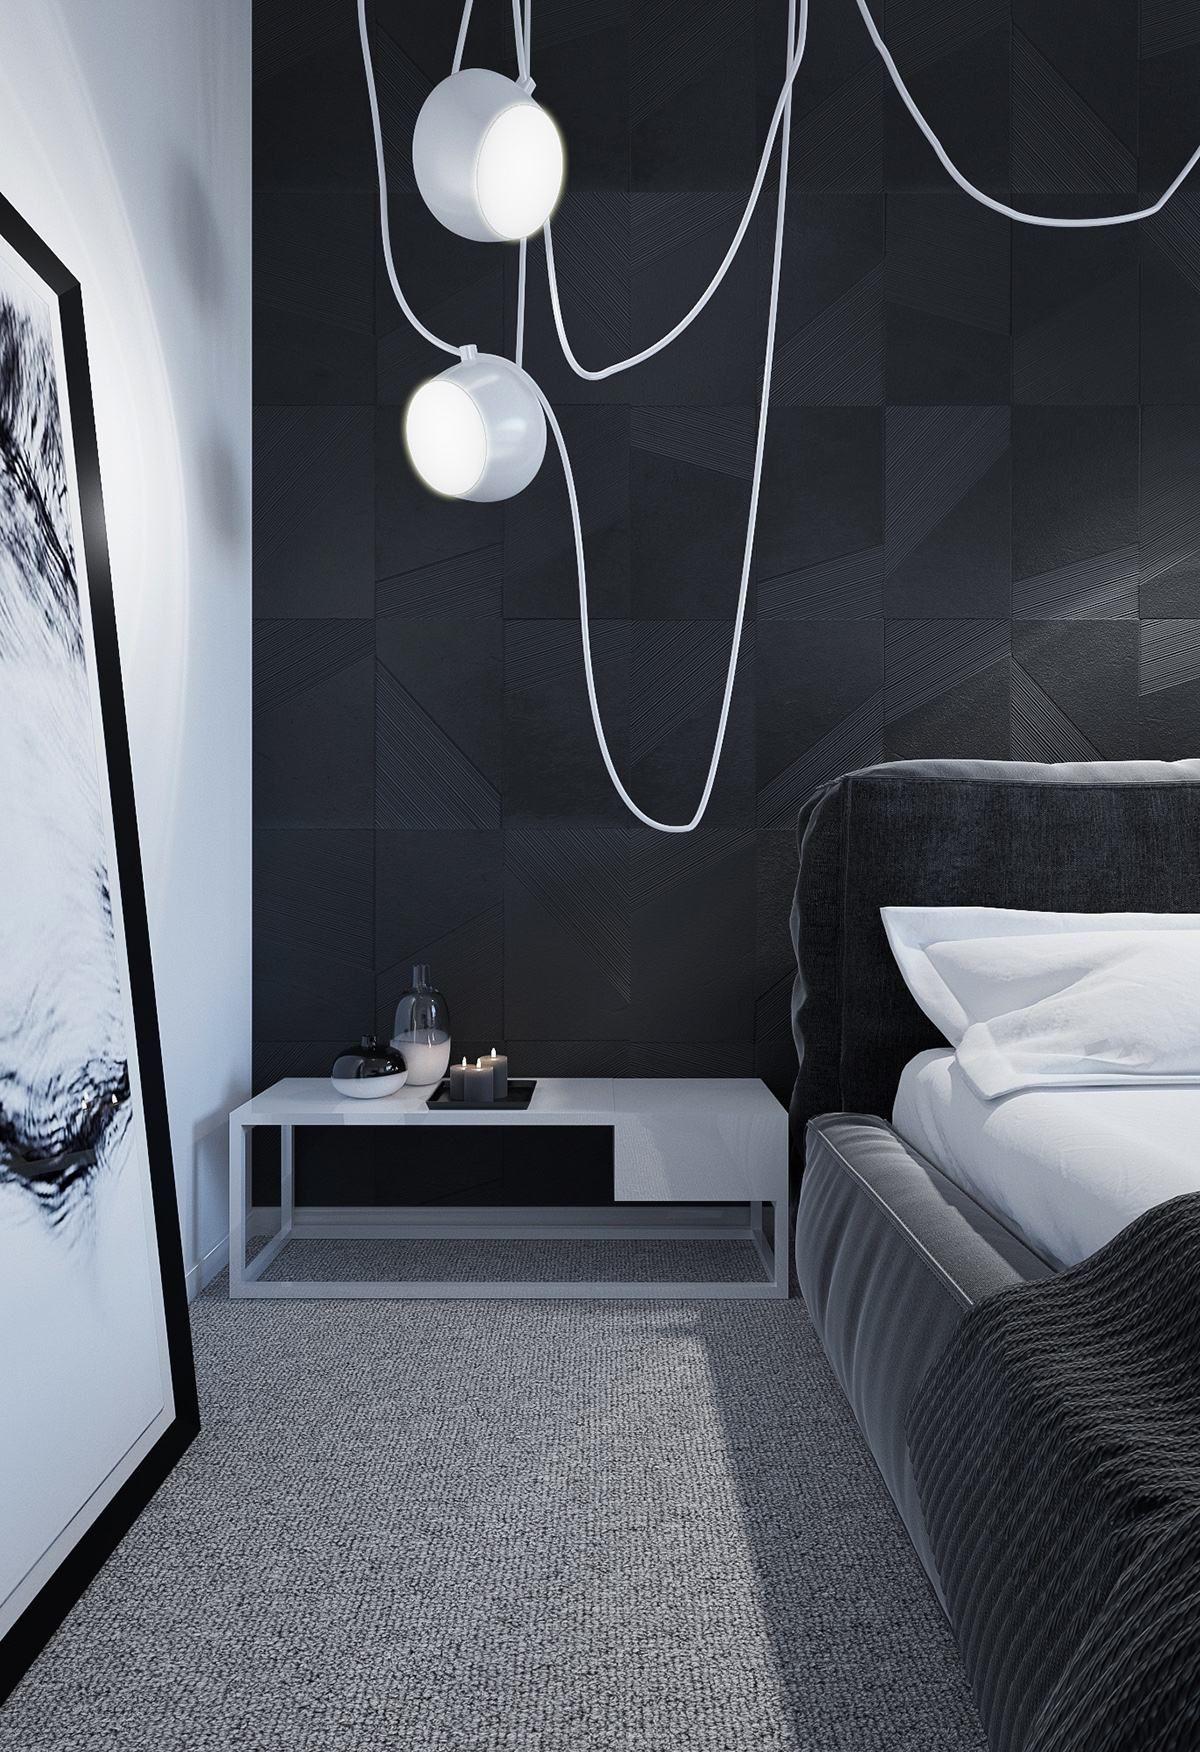 Aim Pendant Lamp On Black Background